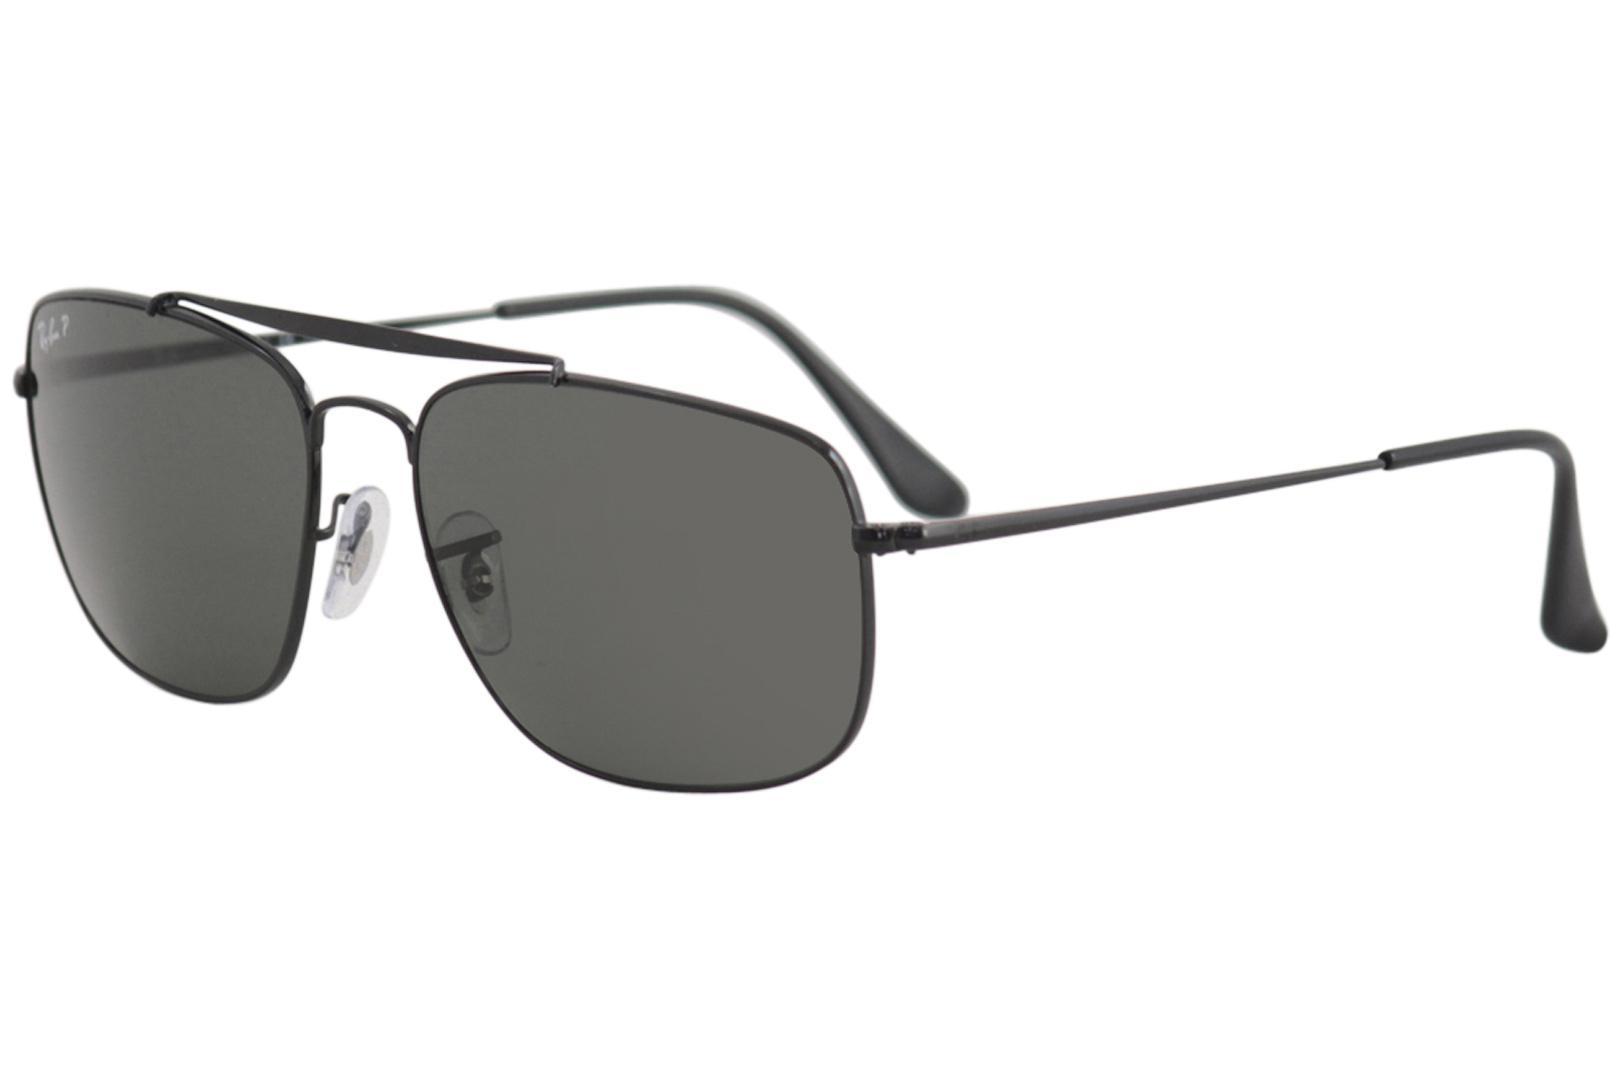 dd49f5fa213 Ray Ban Men s The Colonel RB3560 RB 3560 RayBan Fashion Pilot Sunglasses